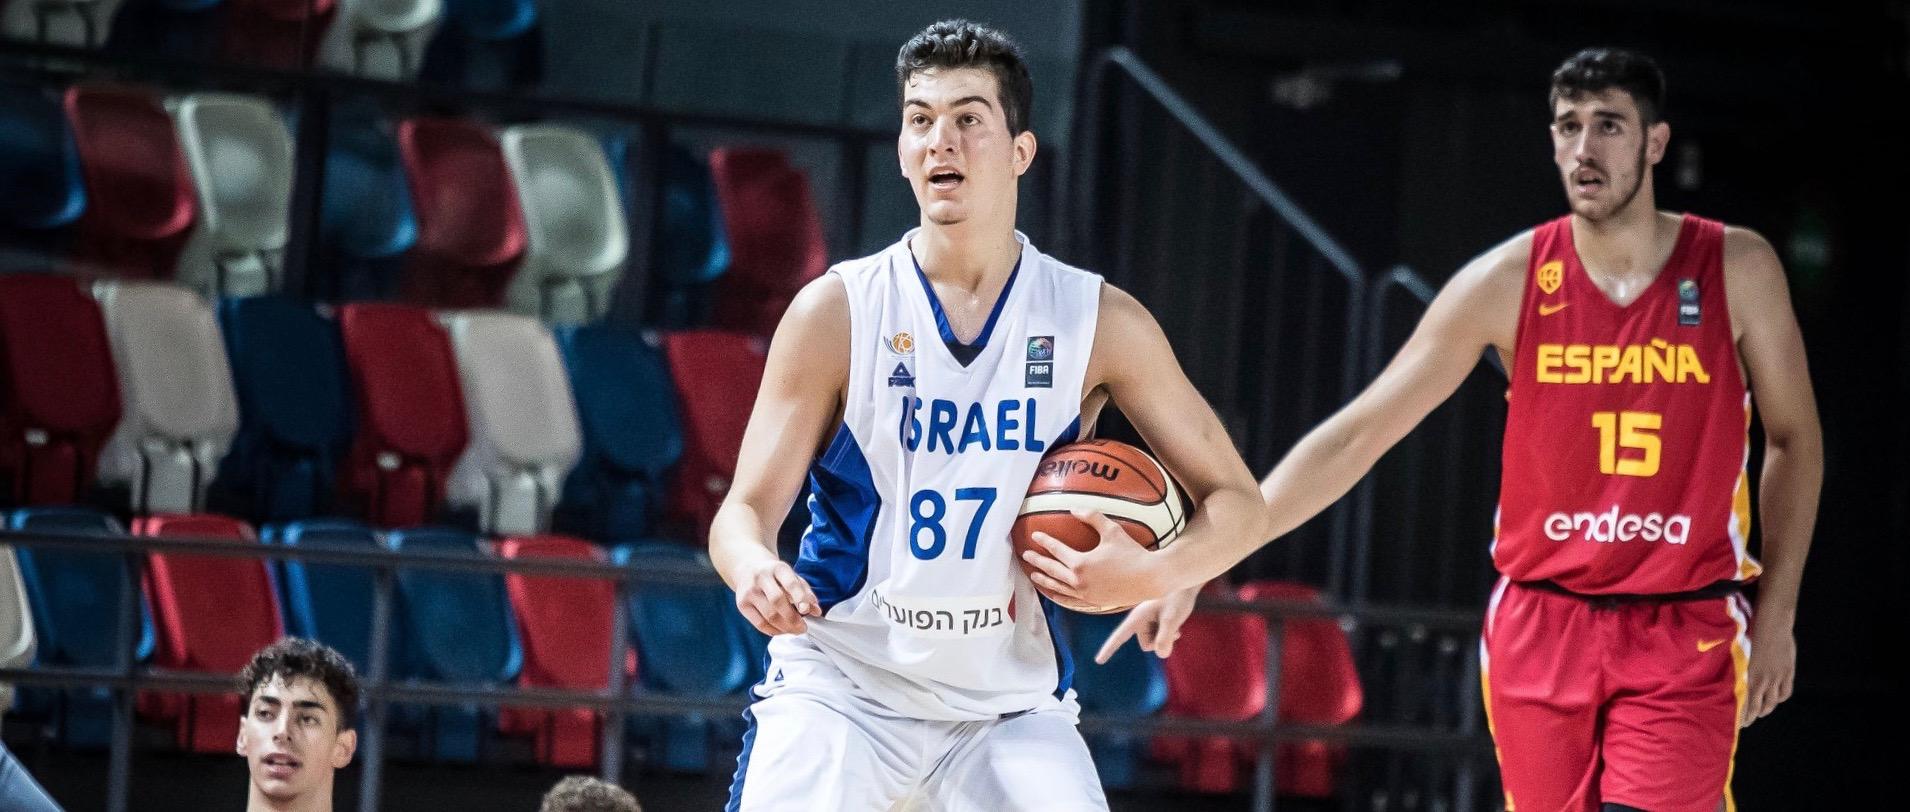 """It's a big honor to be a part of the Israel National Team"" Tomer Levinson Interview ahead of U20 European Championships, Ben Eisenhardt, Dan Shamir, B&W Baseball & More! Israel Sports Rabbi Rundown July 9, 2019"